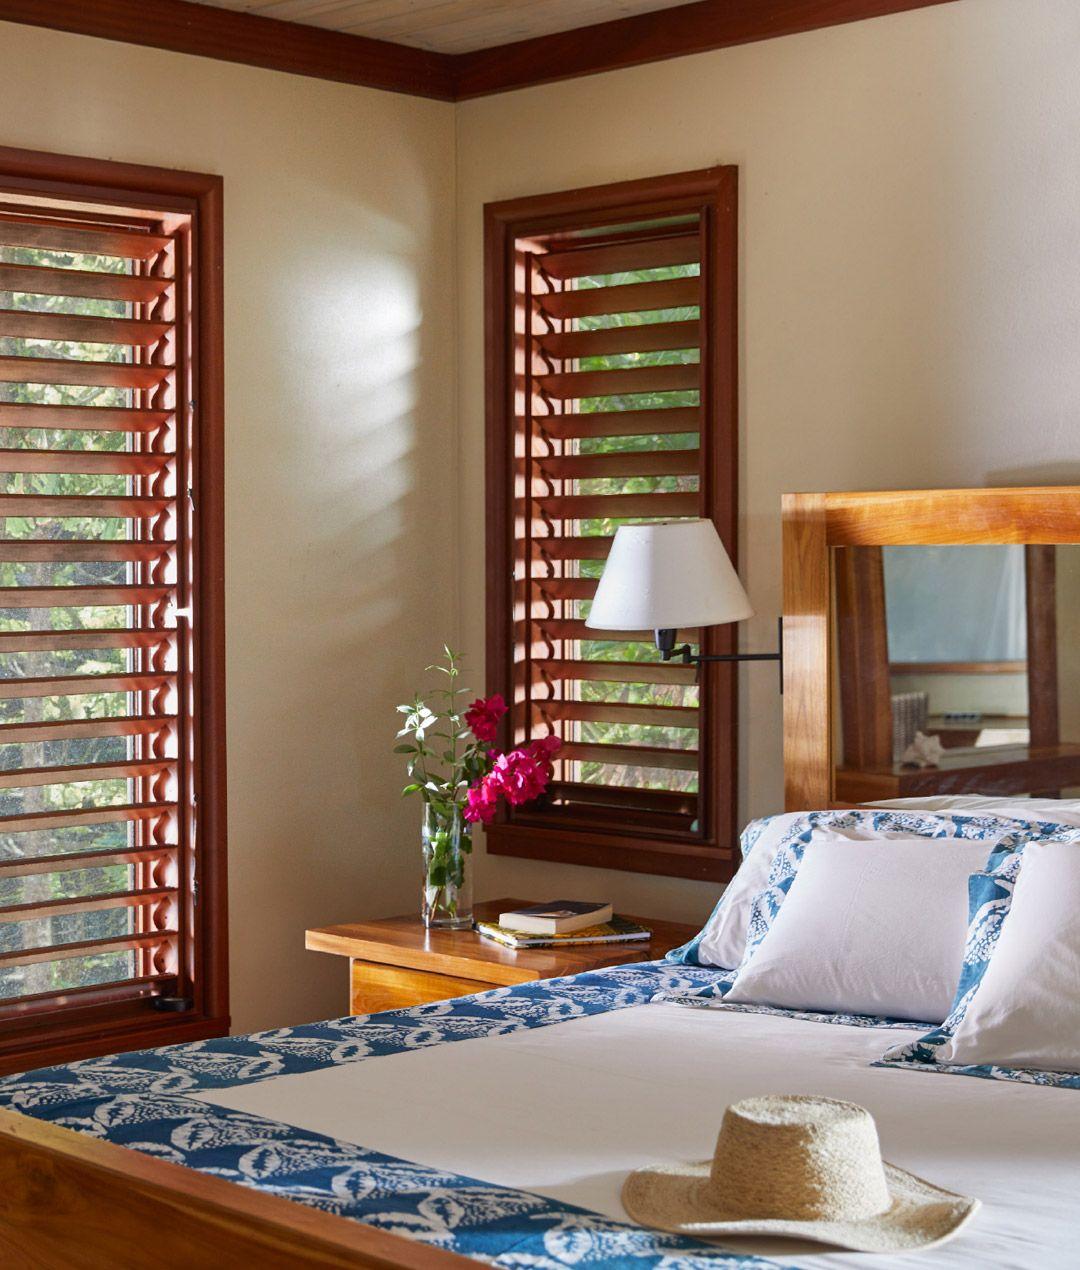 7 One Bedroom Beach Villa Carousel 1